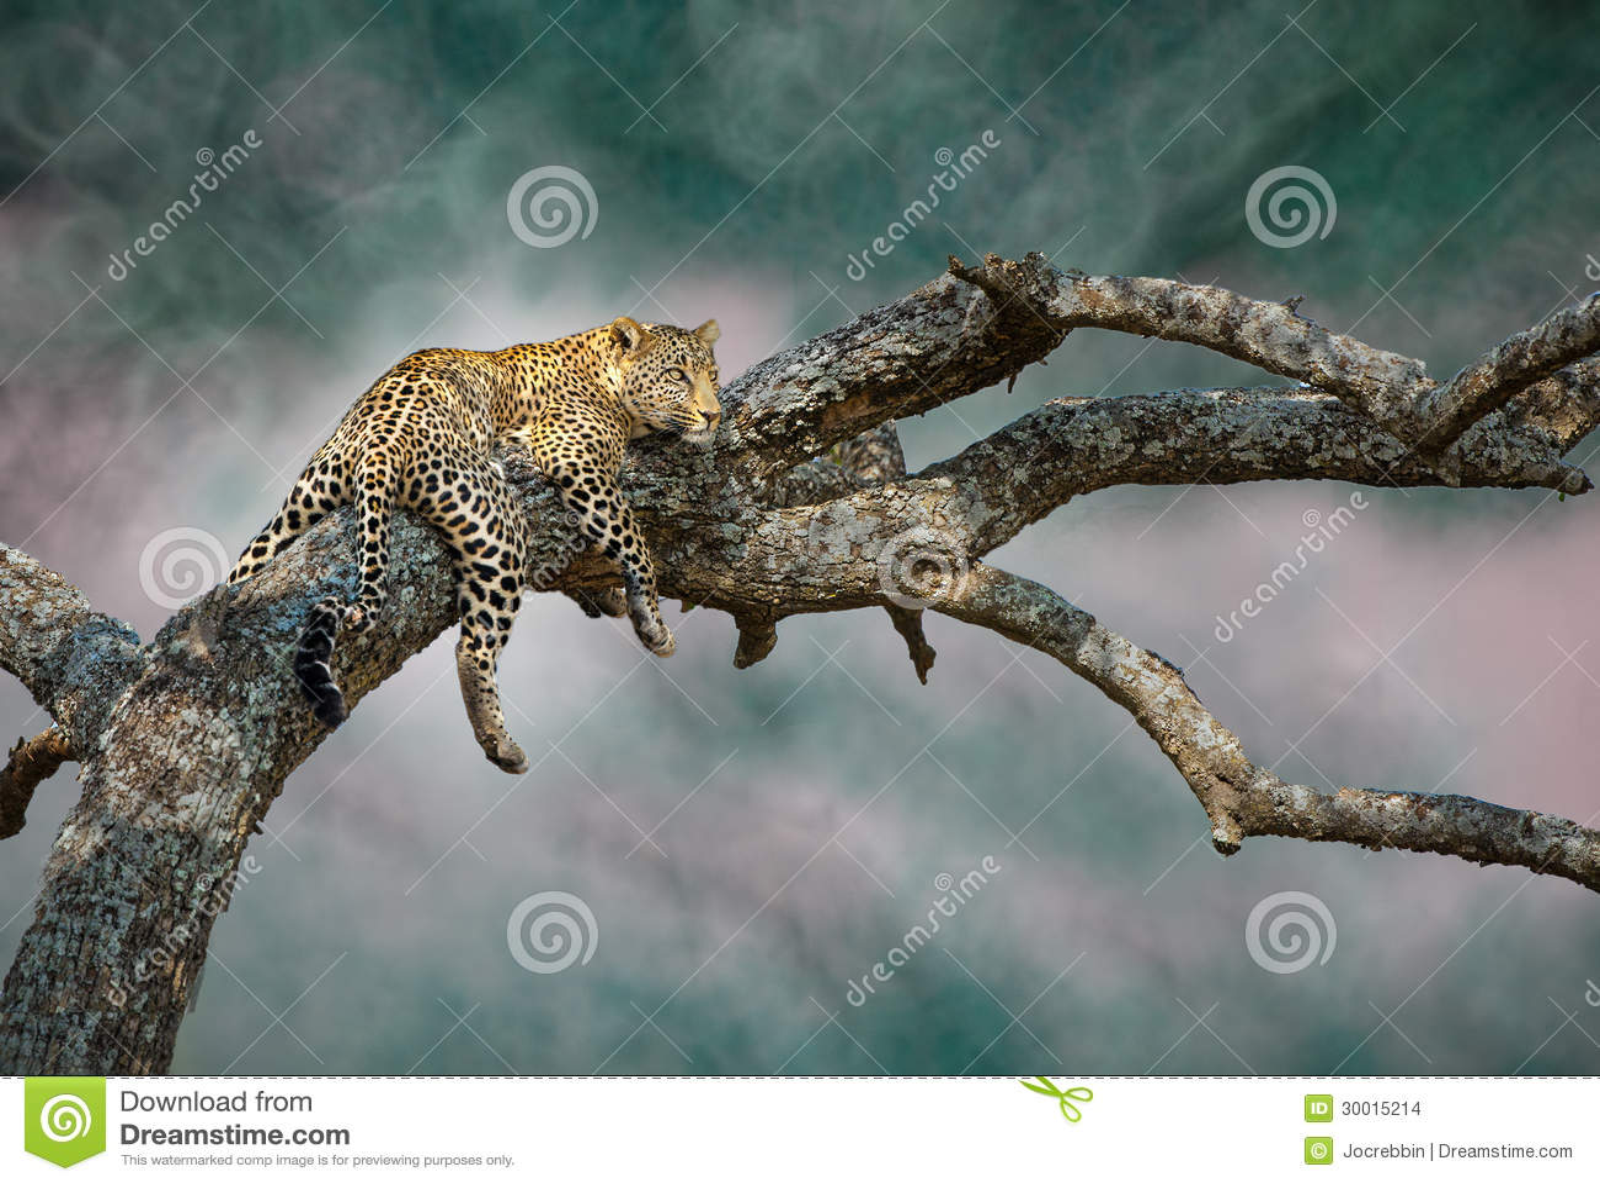 The elusive leopard